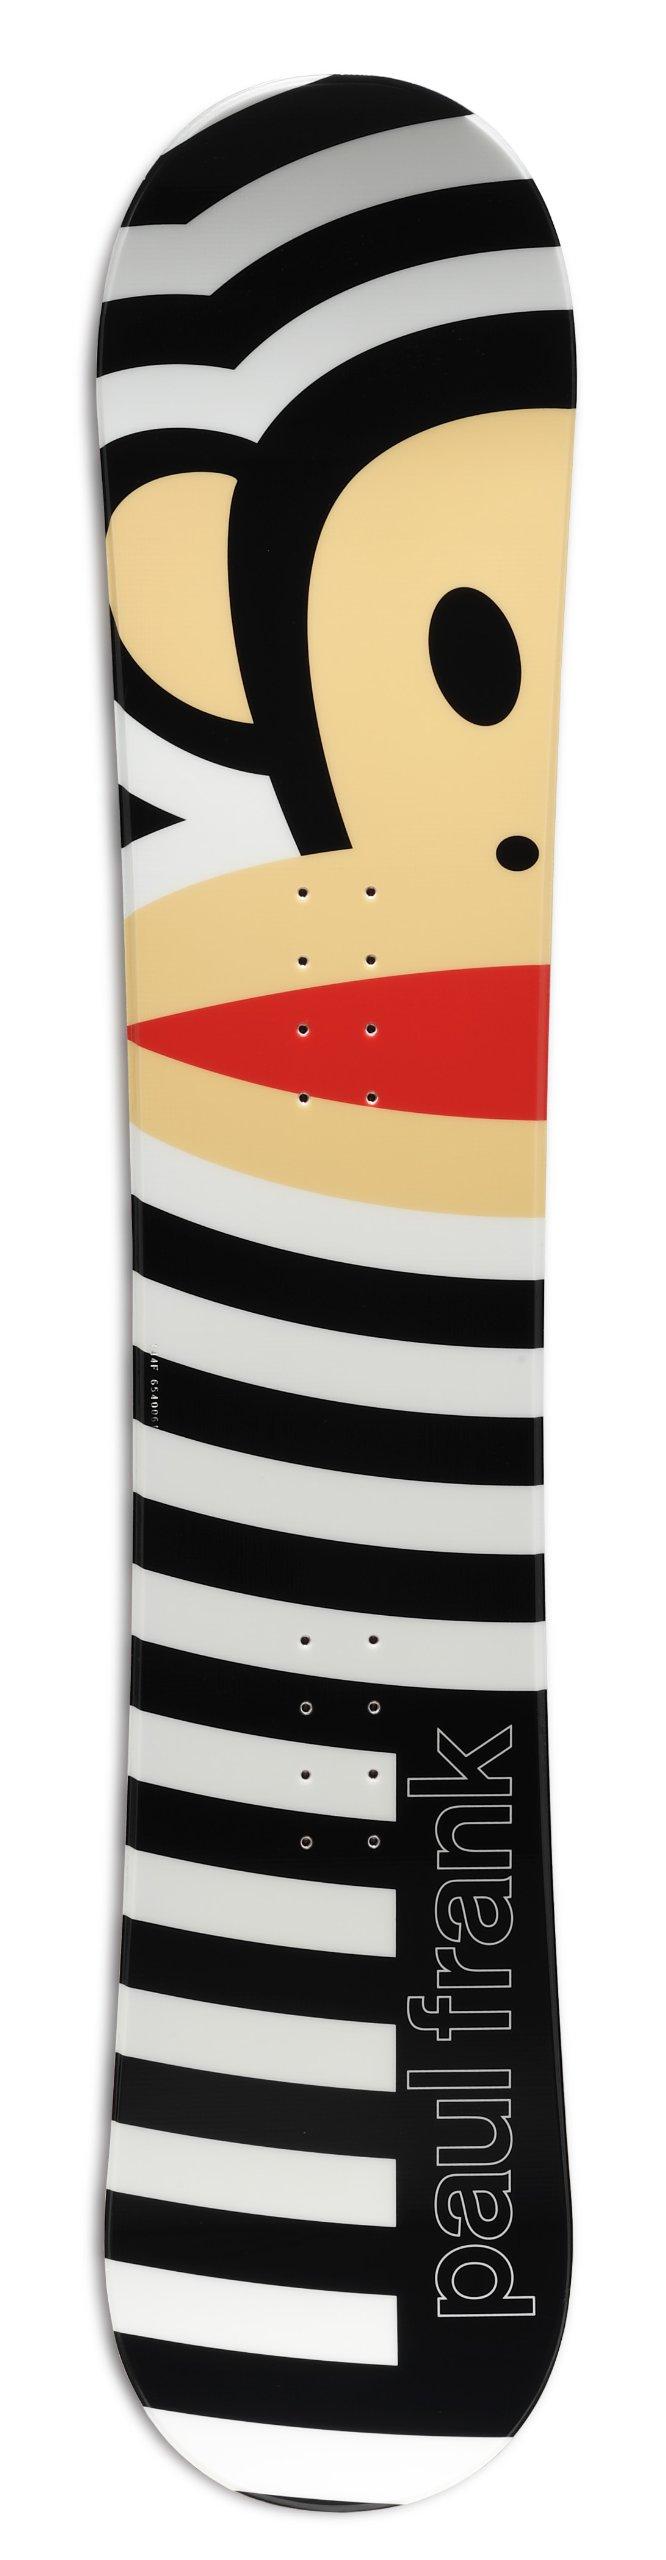 Paul Frank JULIUS WAVE JR Snowboard (133cm) by Paul Frank